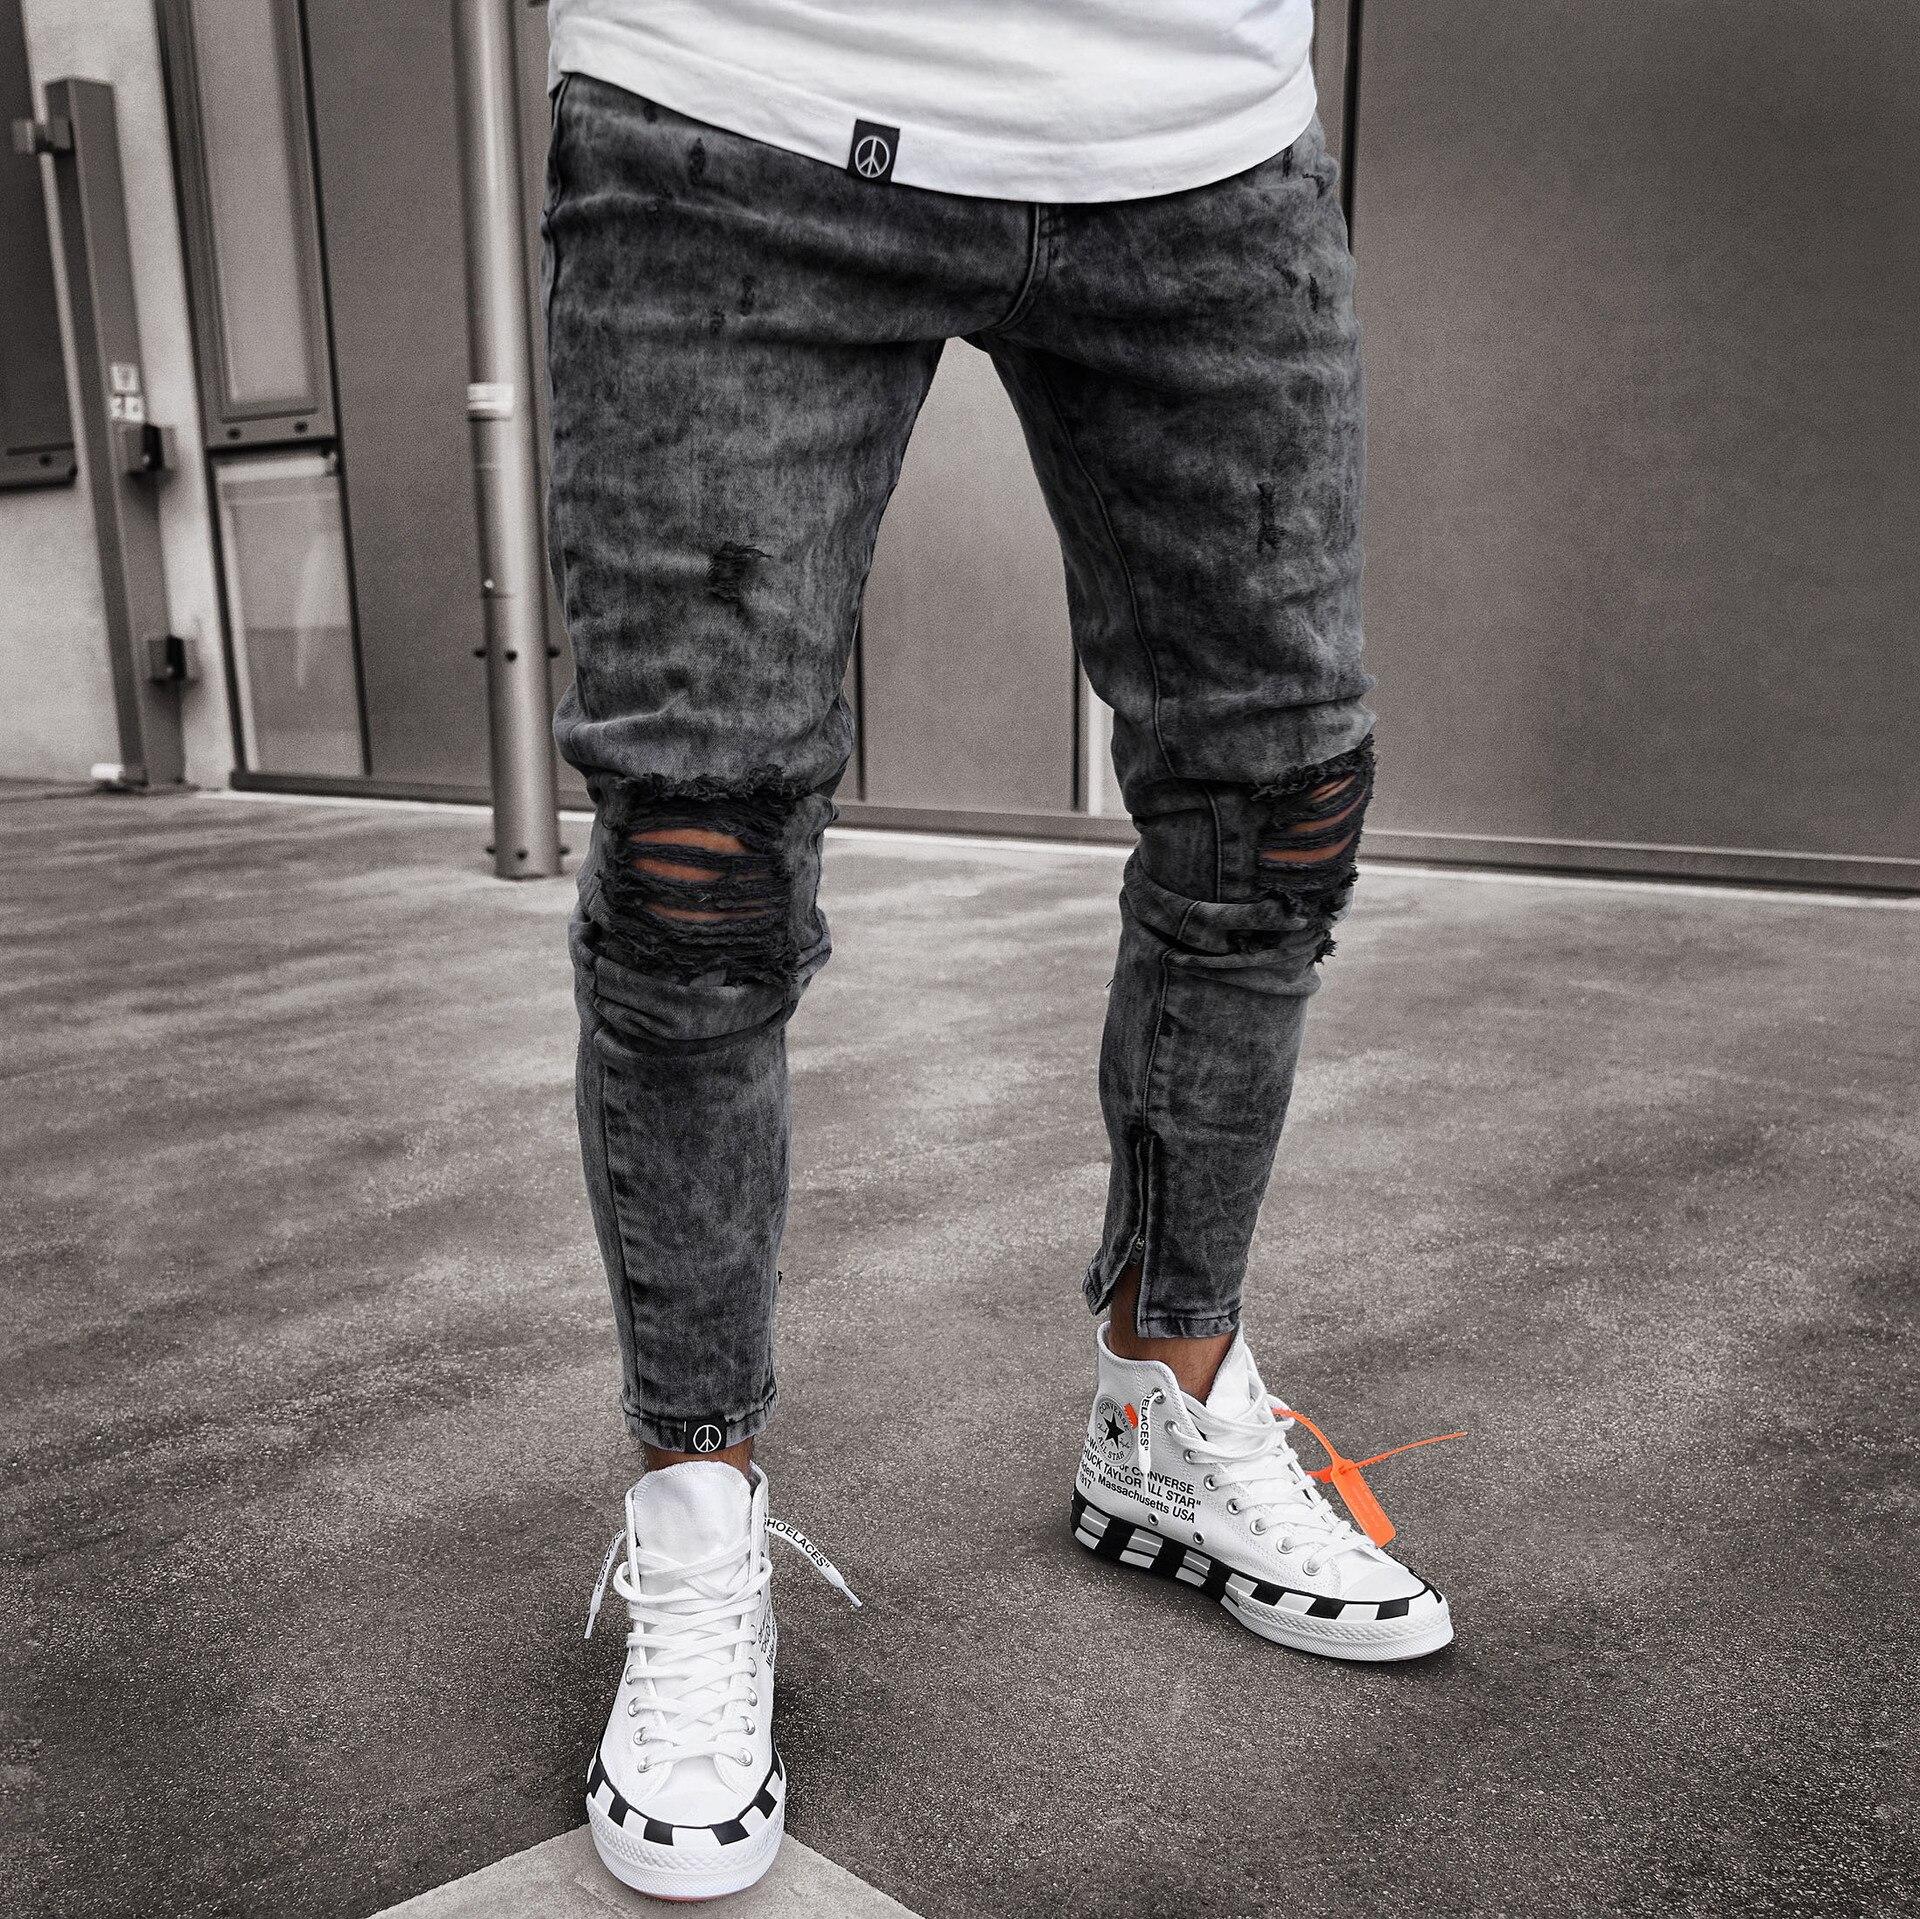 Hot Sale Newest Men's Skinny Jeans Snowflakes Casual Style Slim Denim Fabric Men Jeans with Zipper Leggings Men Slim Jeans Men